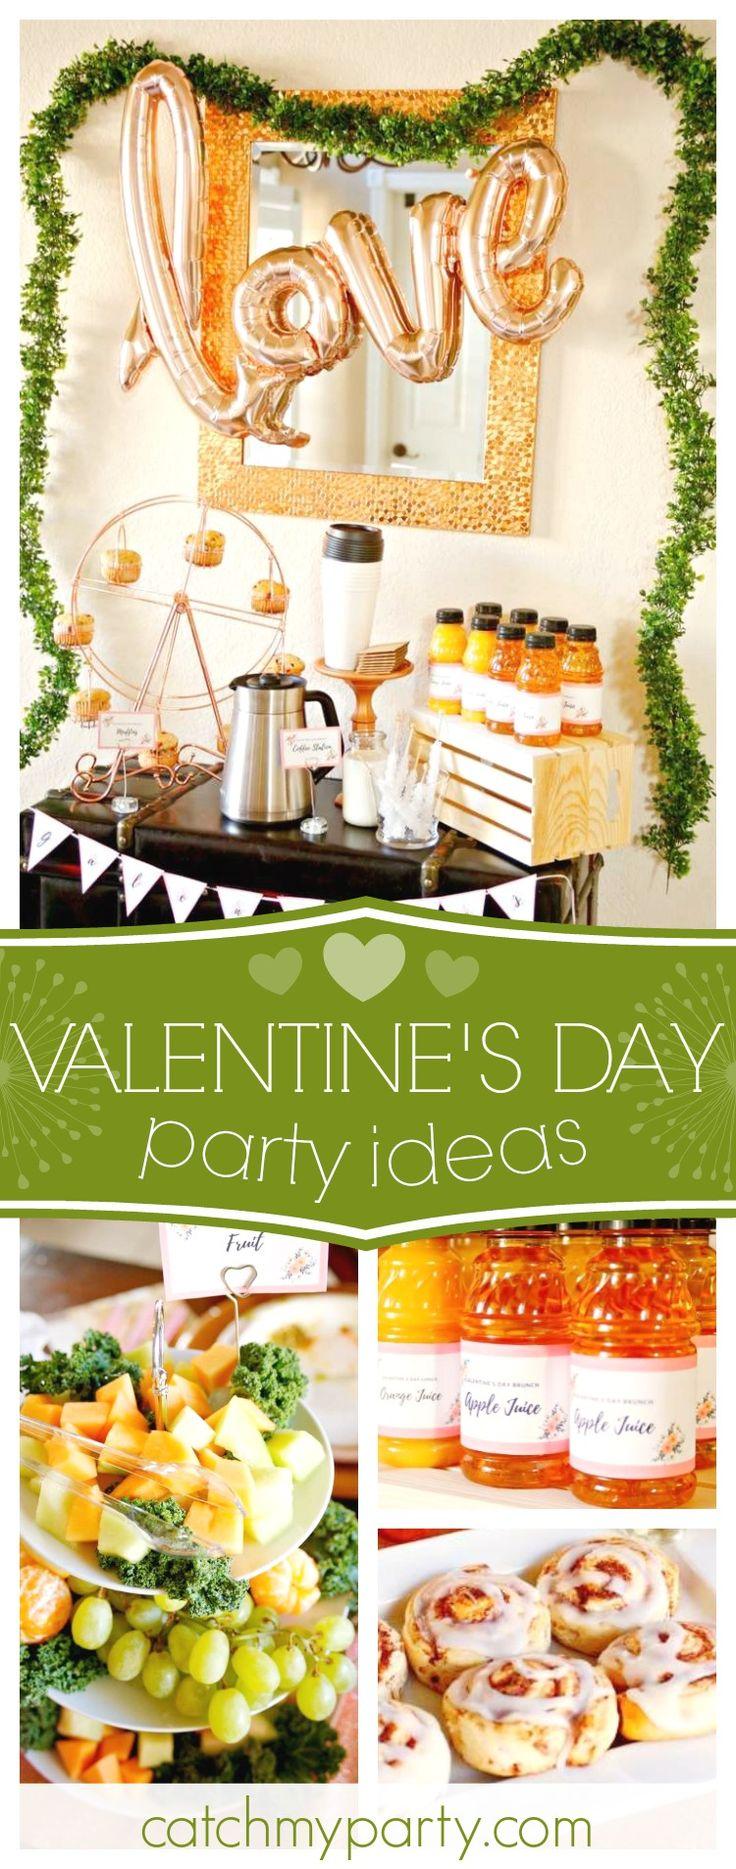 915 best valentine 39 s day party ideas images on pinterest. Black Bedroom Furniture Sets. Home Design Ideas